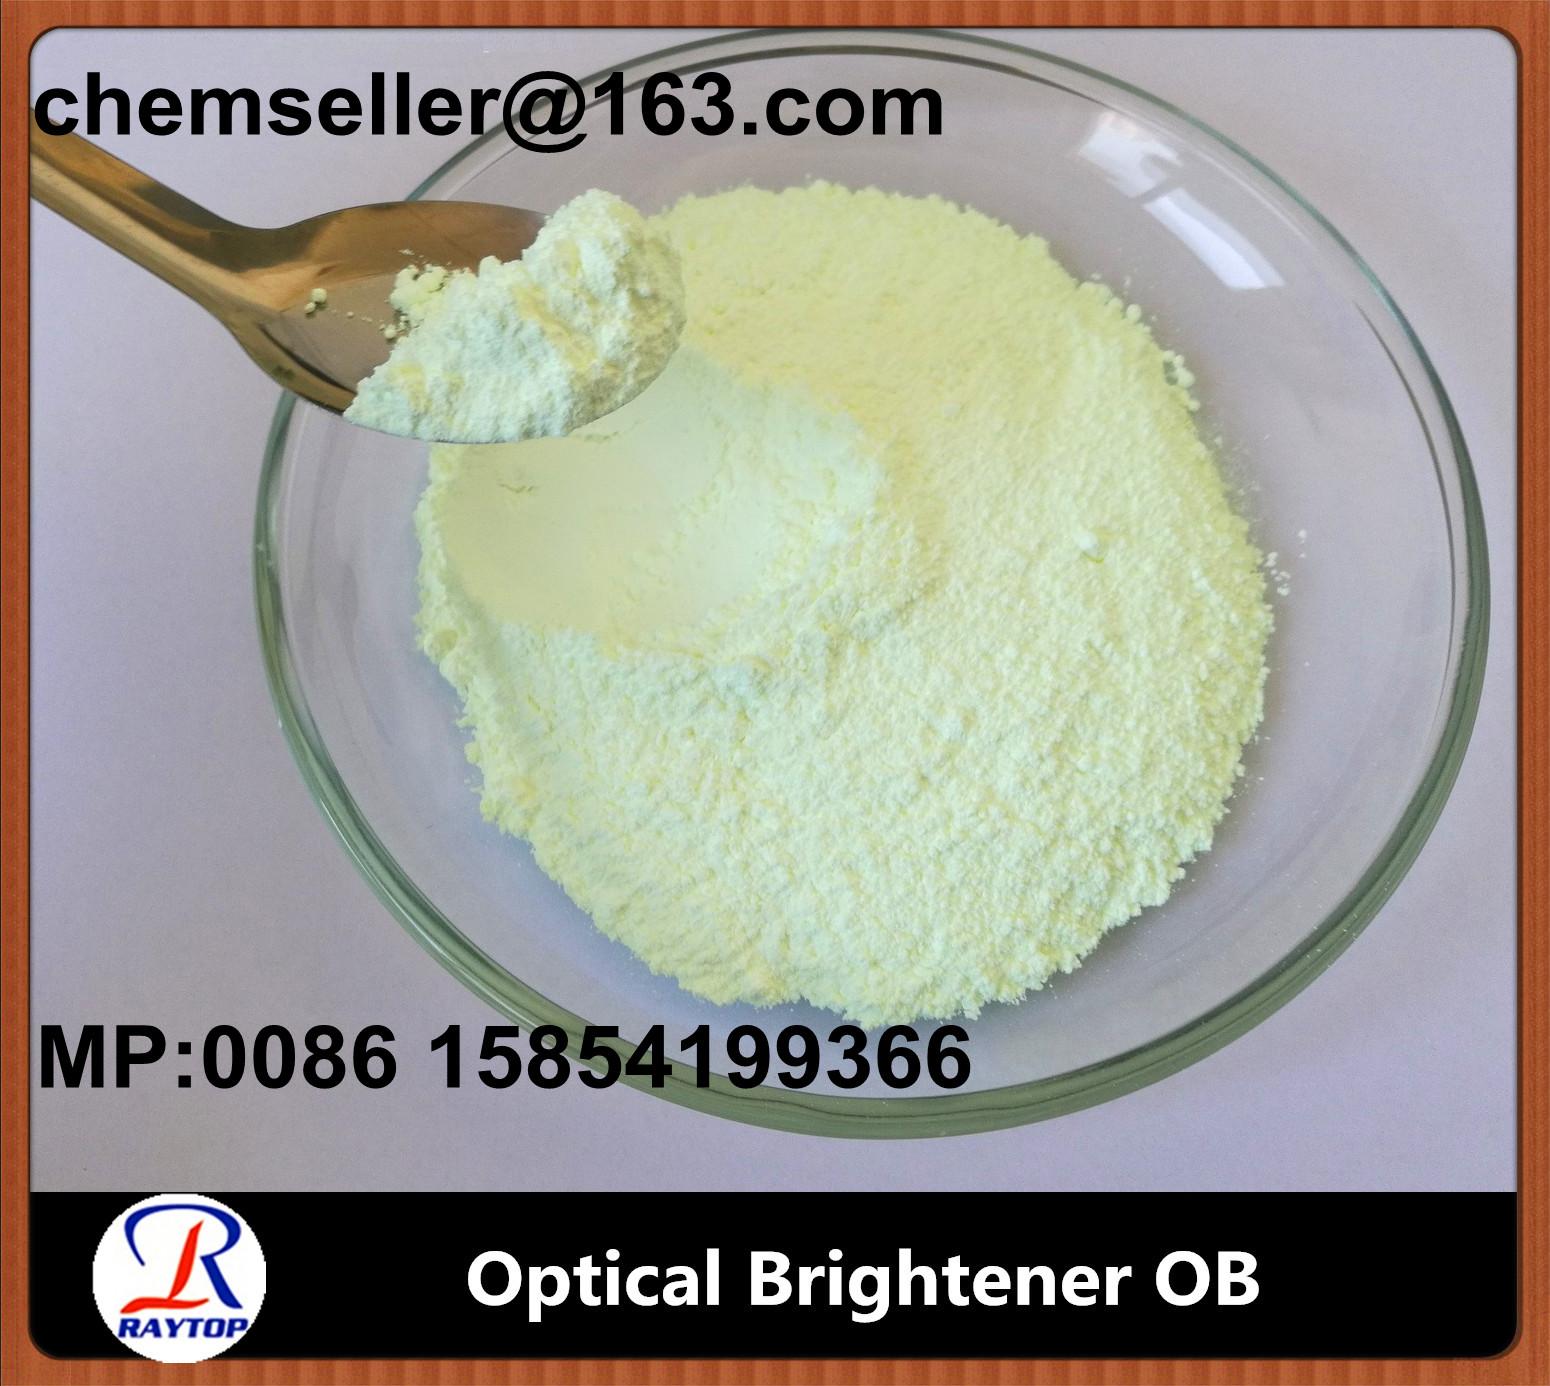 Fluorecent Brightener 184 CAS NO 7128-64-5 for Coating